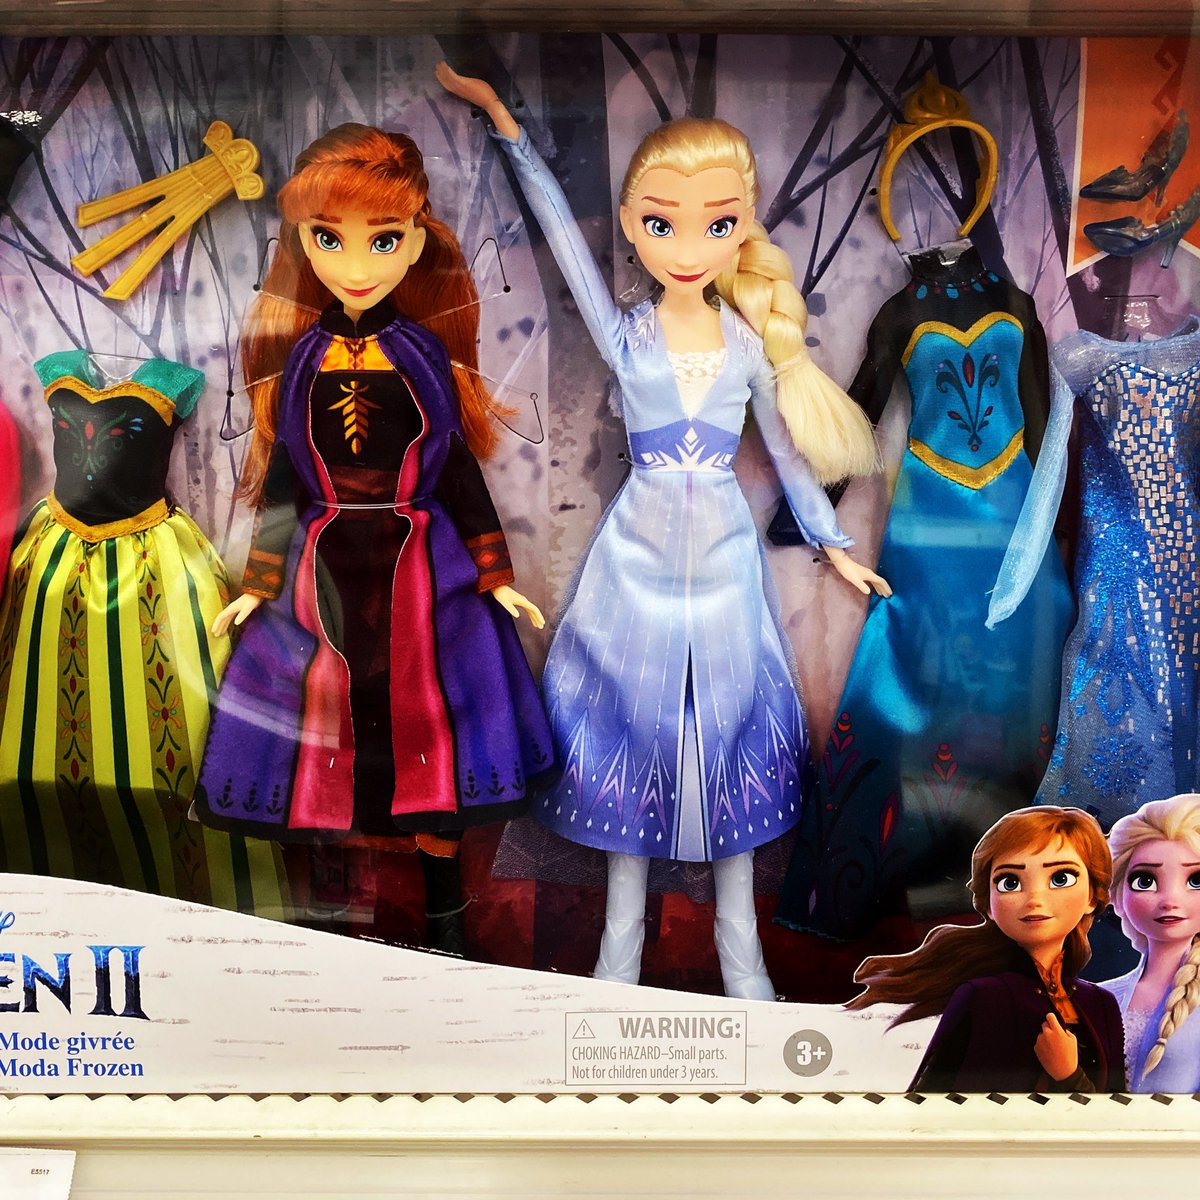 ☀️ Best dating barbie dolls images 2019